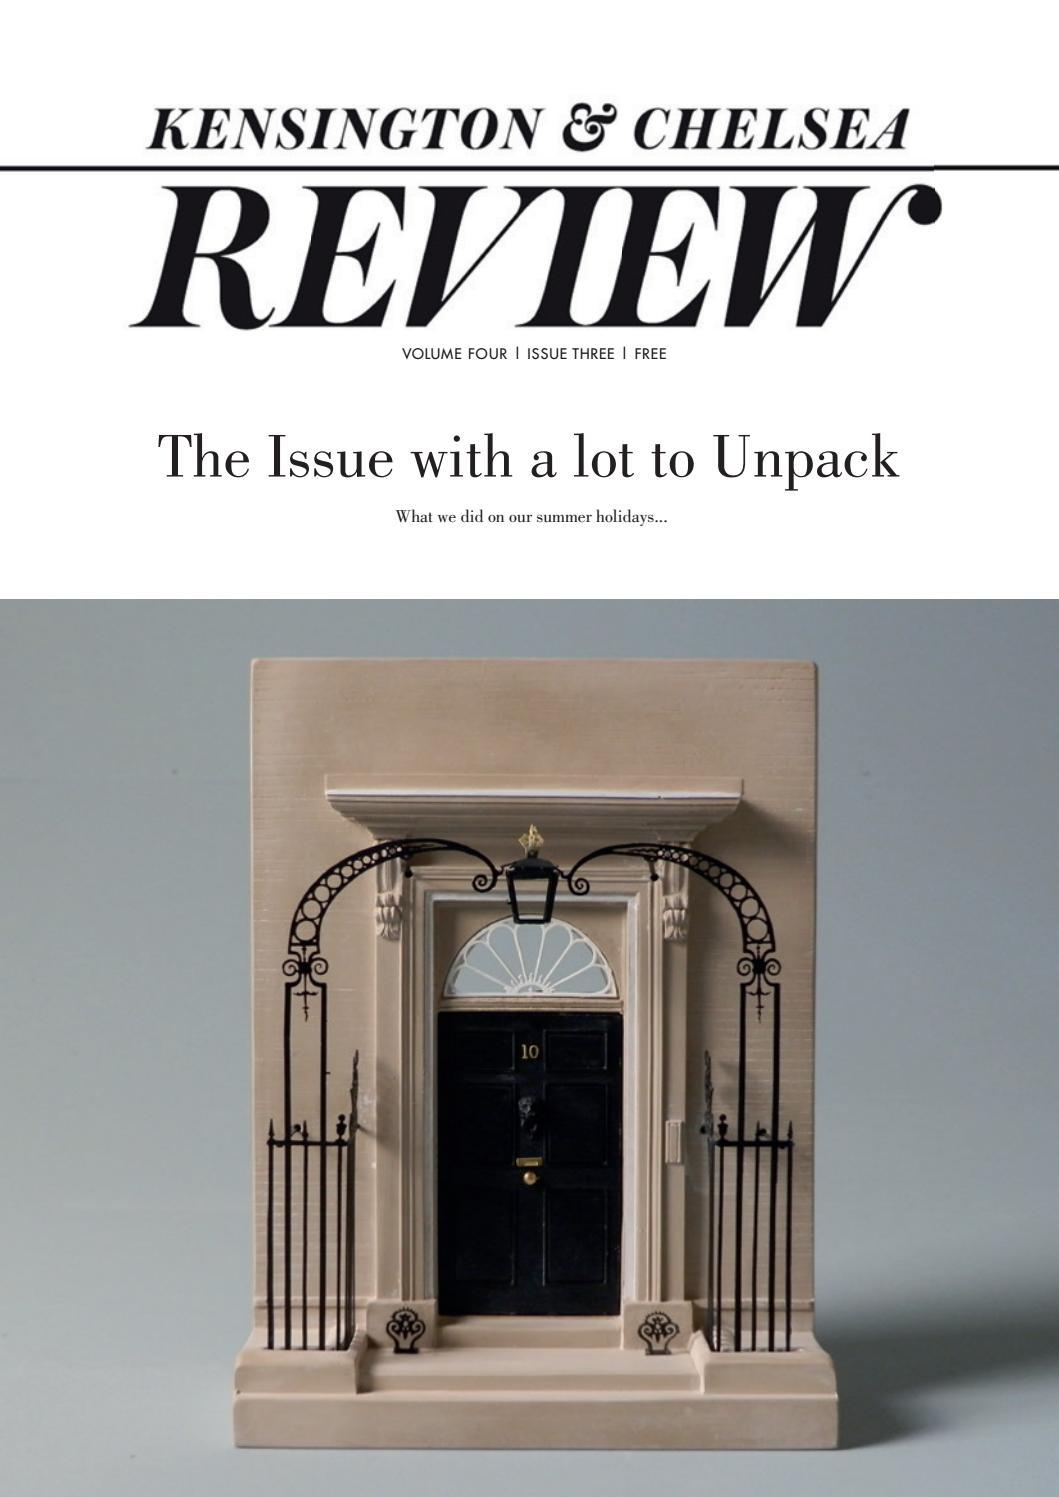 c993e52e839 Kensington and Chelsea Review - Unpack Issue - Autumn 2018 by Kensington  and Chelsea Review - issuu